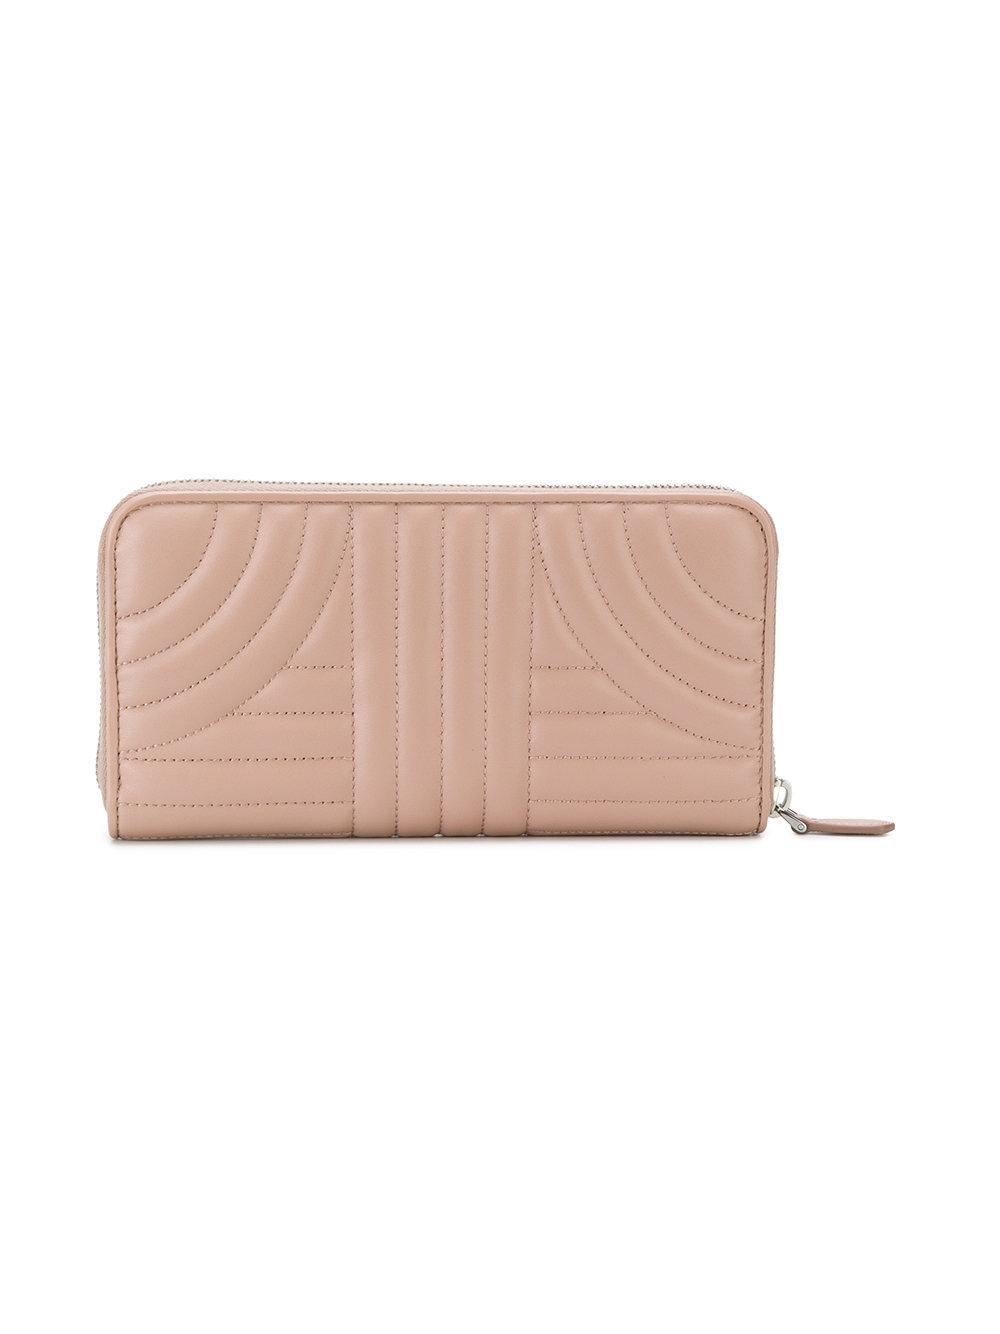 bevelled continental wallet - Nude & Neutrals Prada ctfN3qrIc